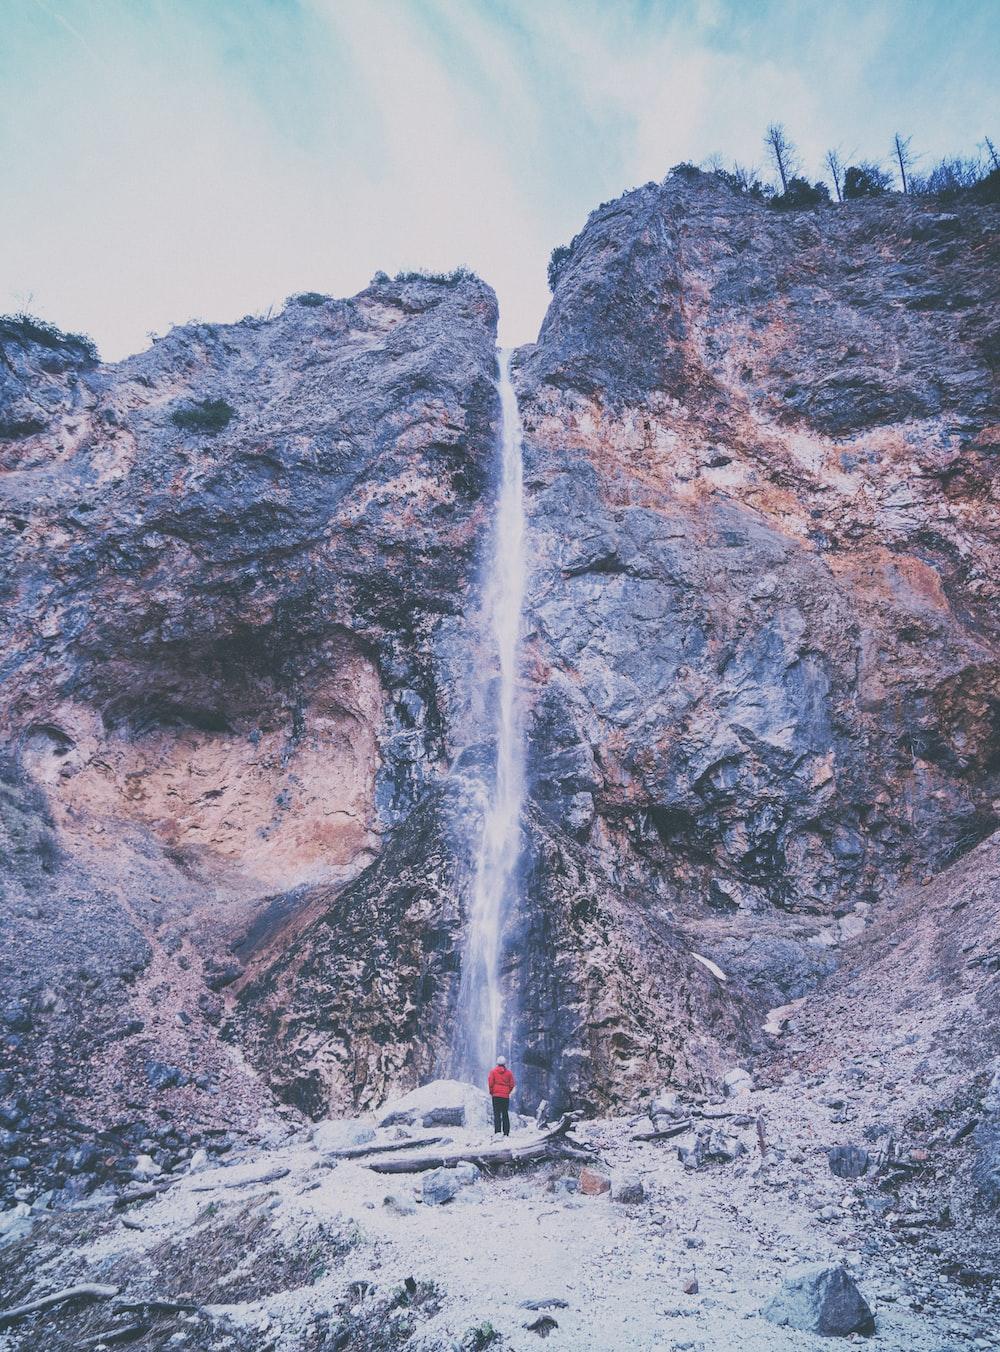 person wearing red jacket standing near waterfalls